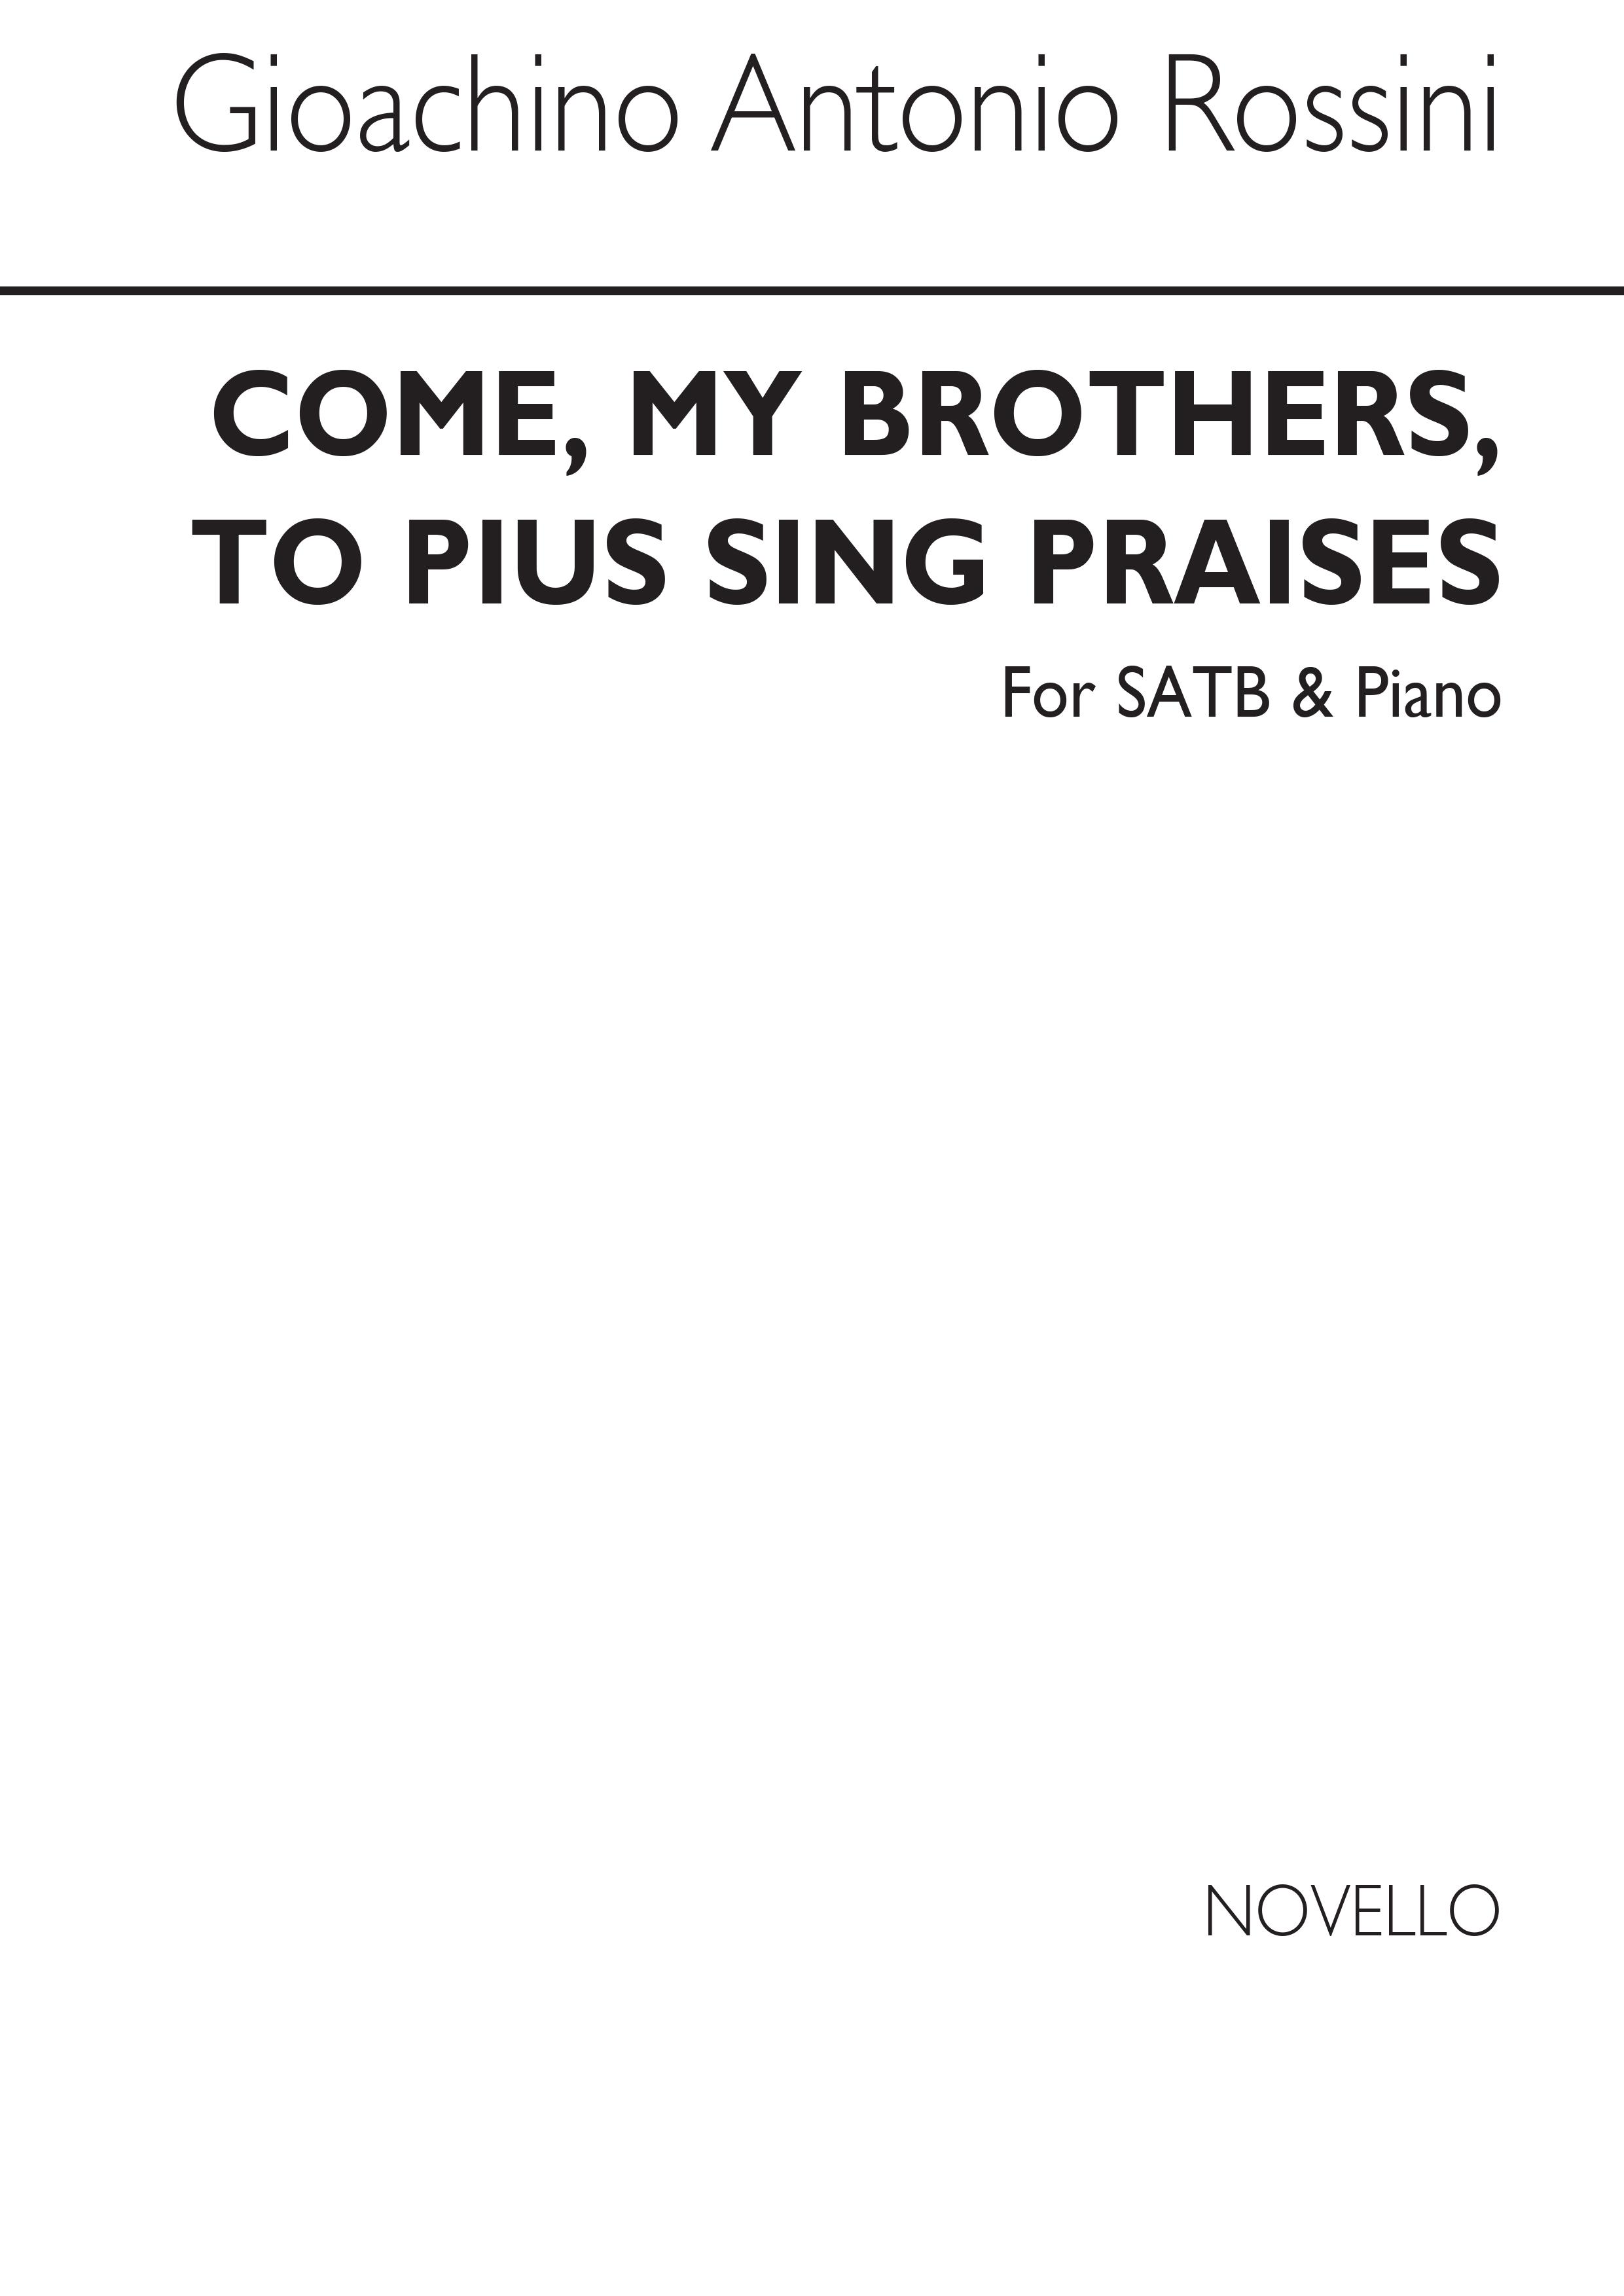 Gioachino Rossini: Come My Brothers To Pius Sing Praises: SATB: Vocal Score